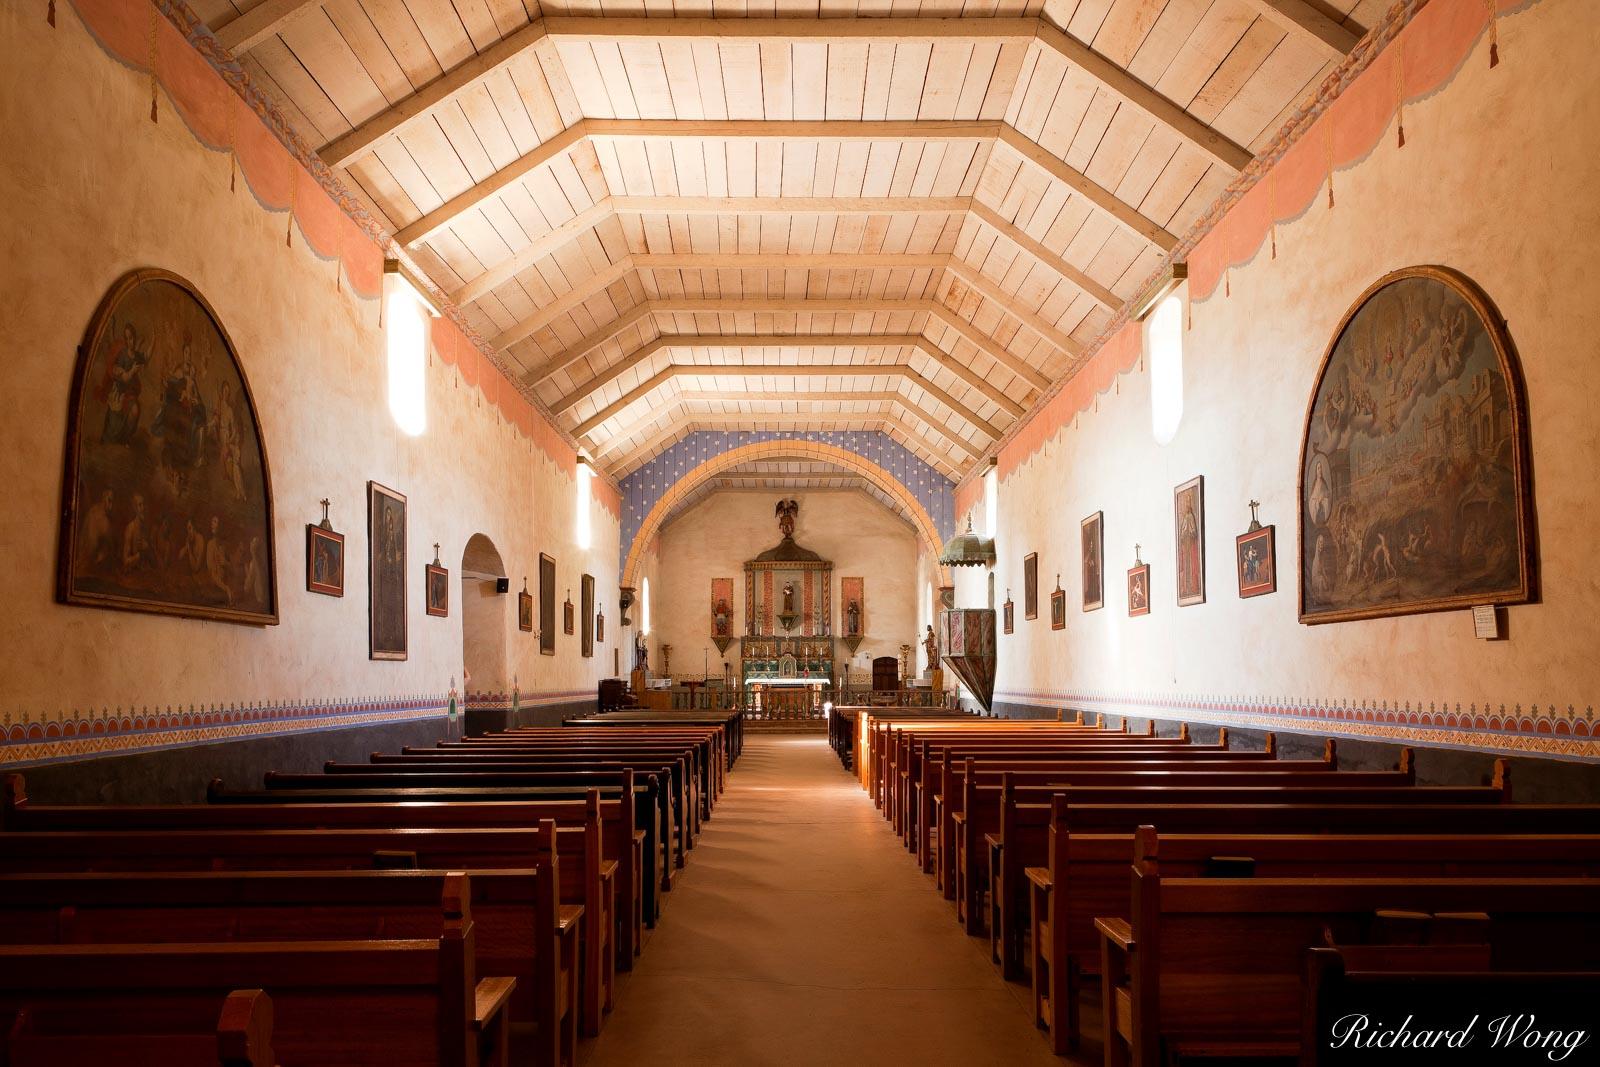 Mission San Antonio de Padua Chapel Interior, Monterey County, California, photo, photo